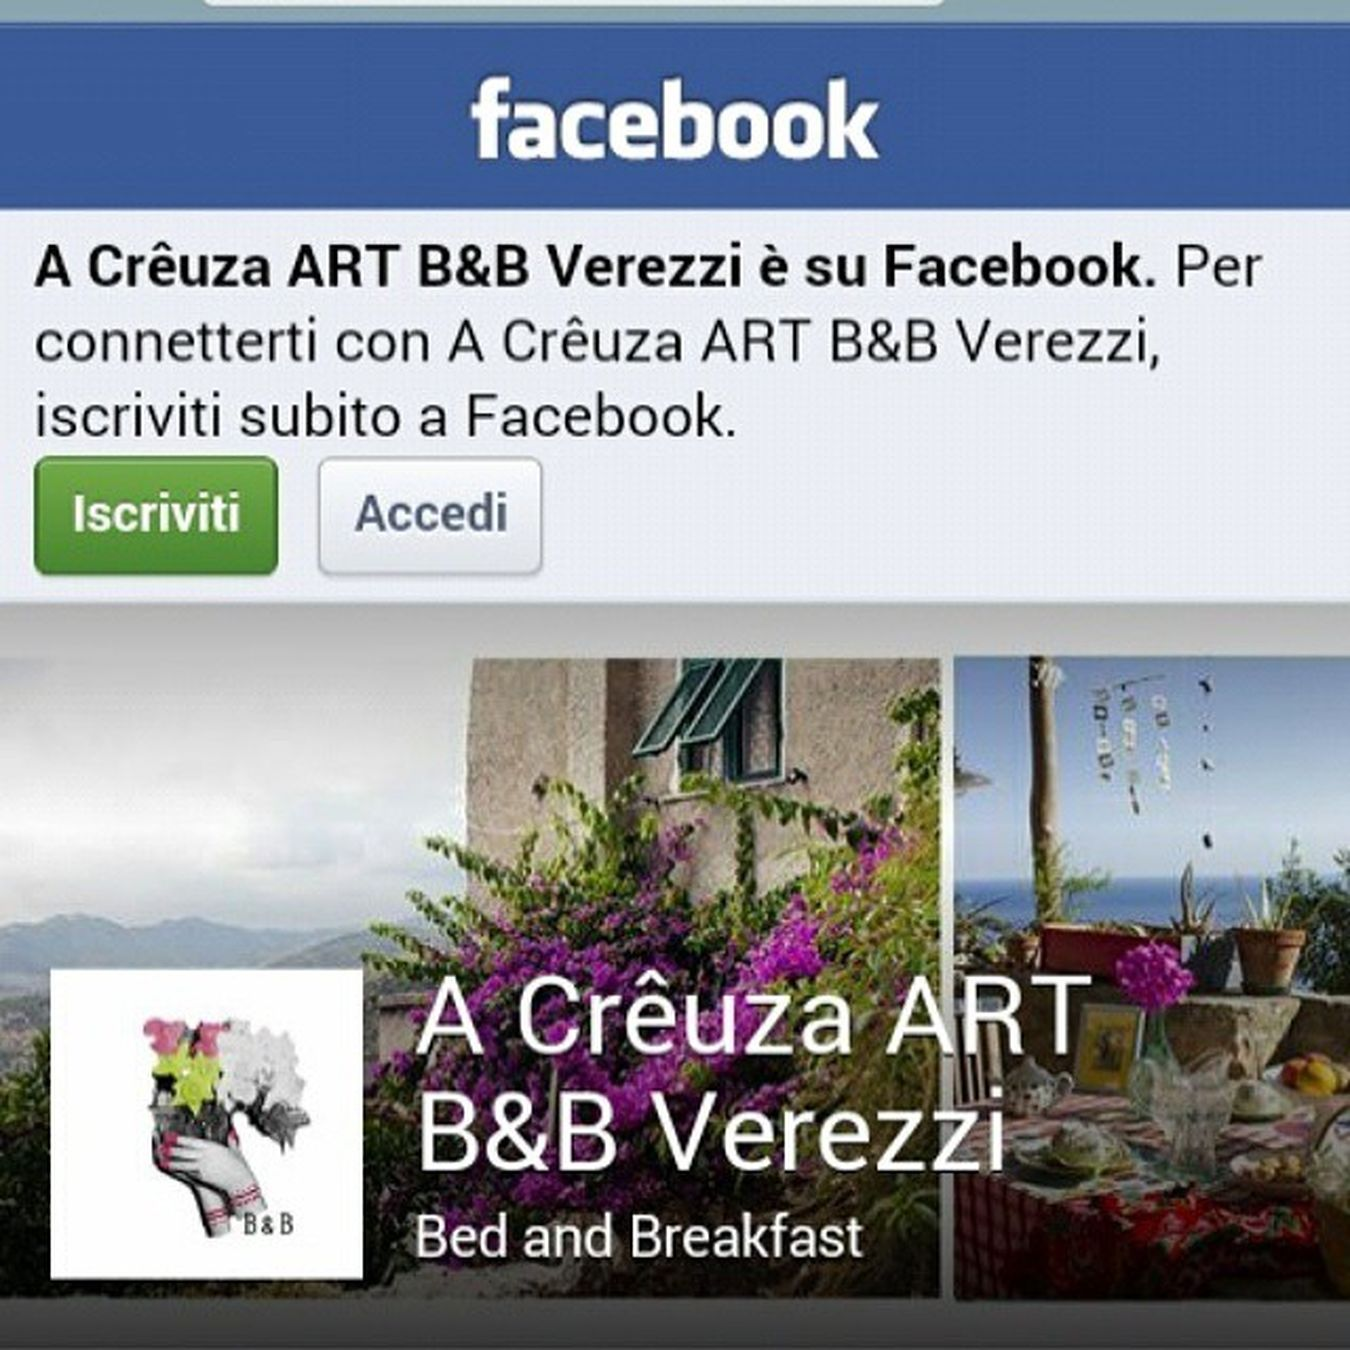 Follow my Little Art B&B on facebook.com/acreuzaverezzi @acreuzaverezzi Verezzi Liguria Art Bedandbreakfast borgioverezzi facebook like summer italy